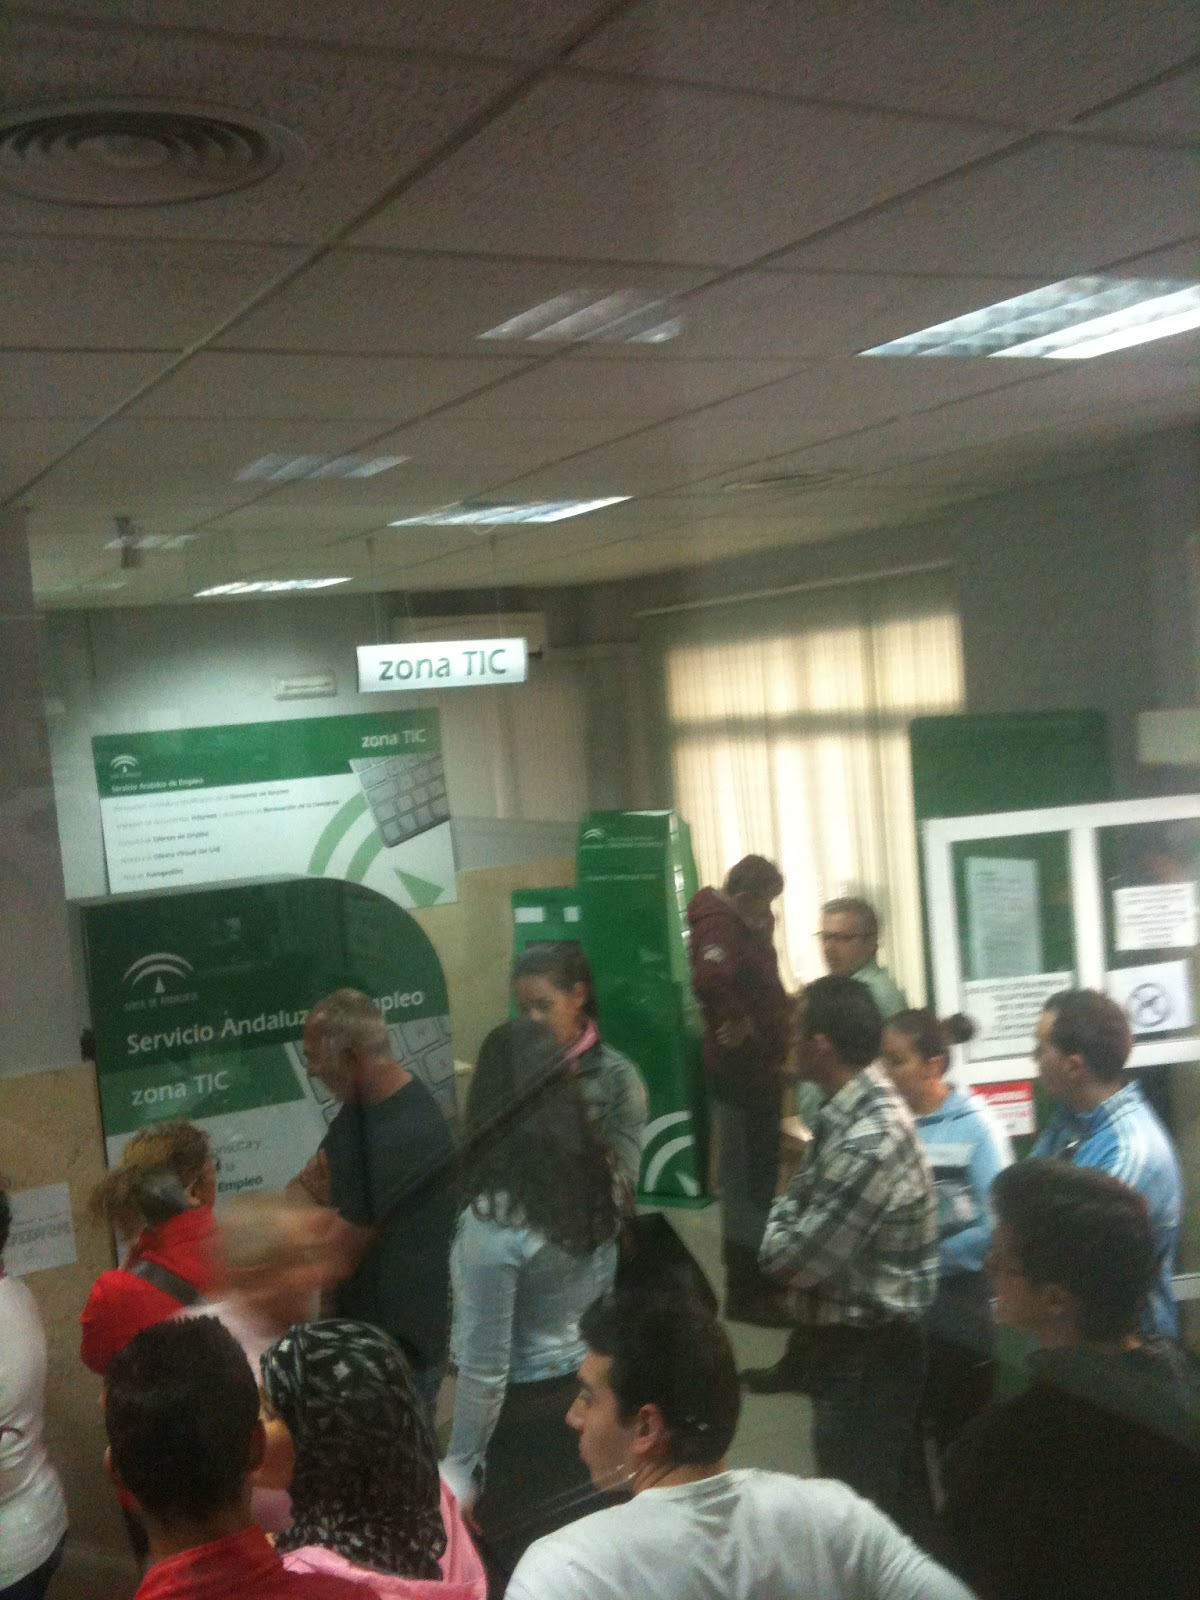 Promotores de empleo las oficinas sae desmanteladas a for Oficina del sae